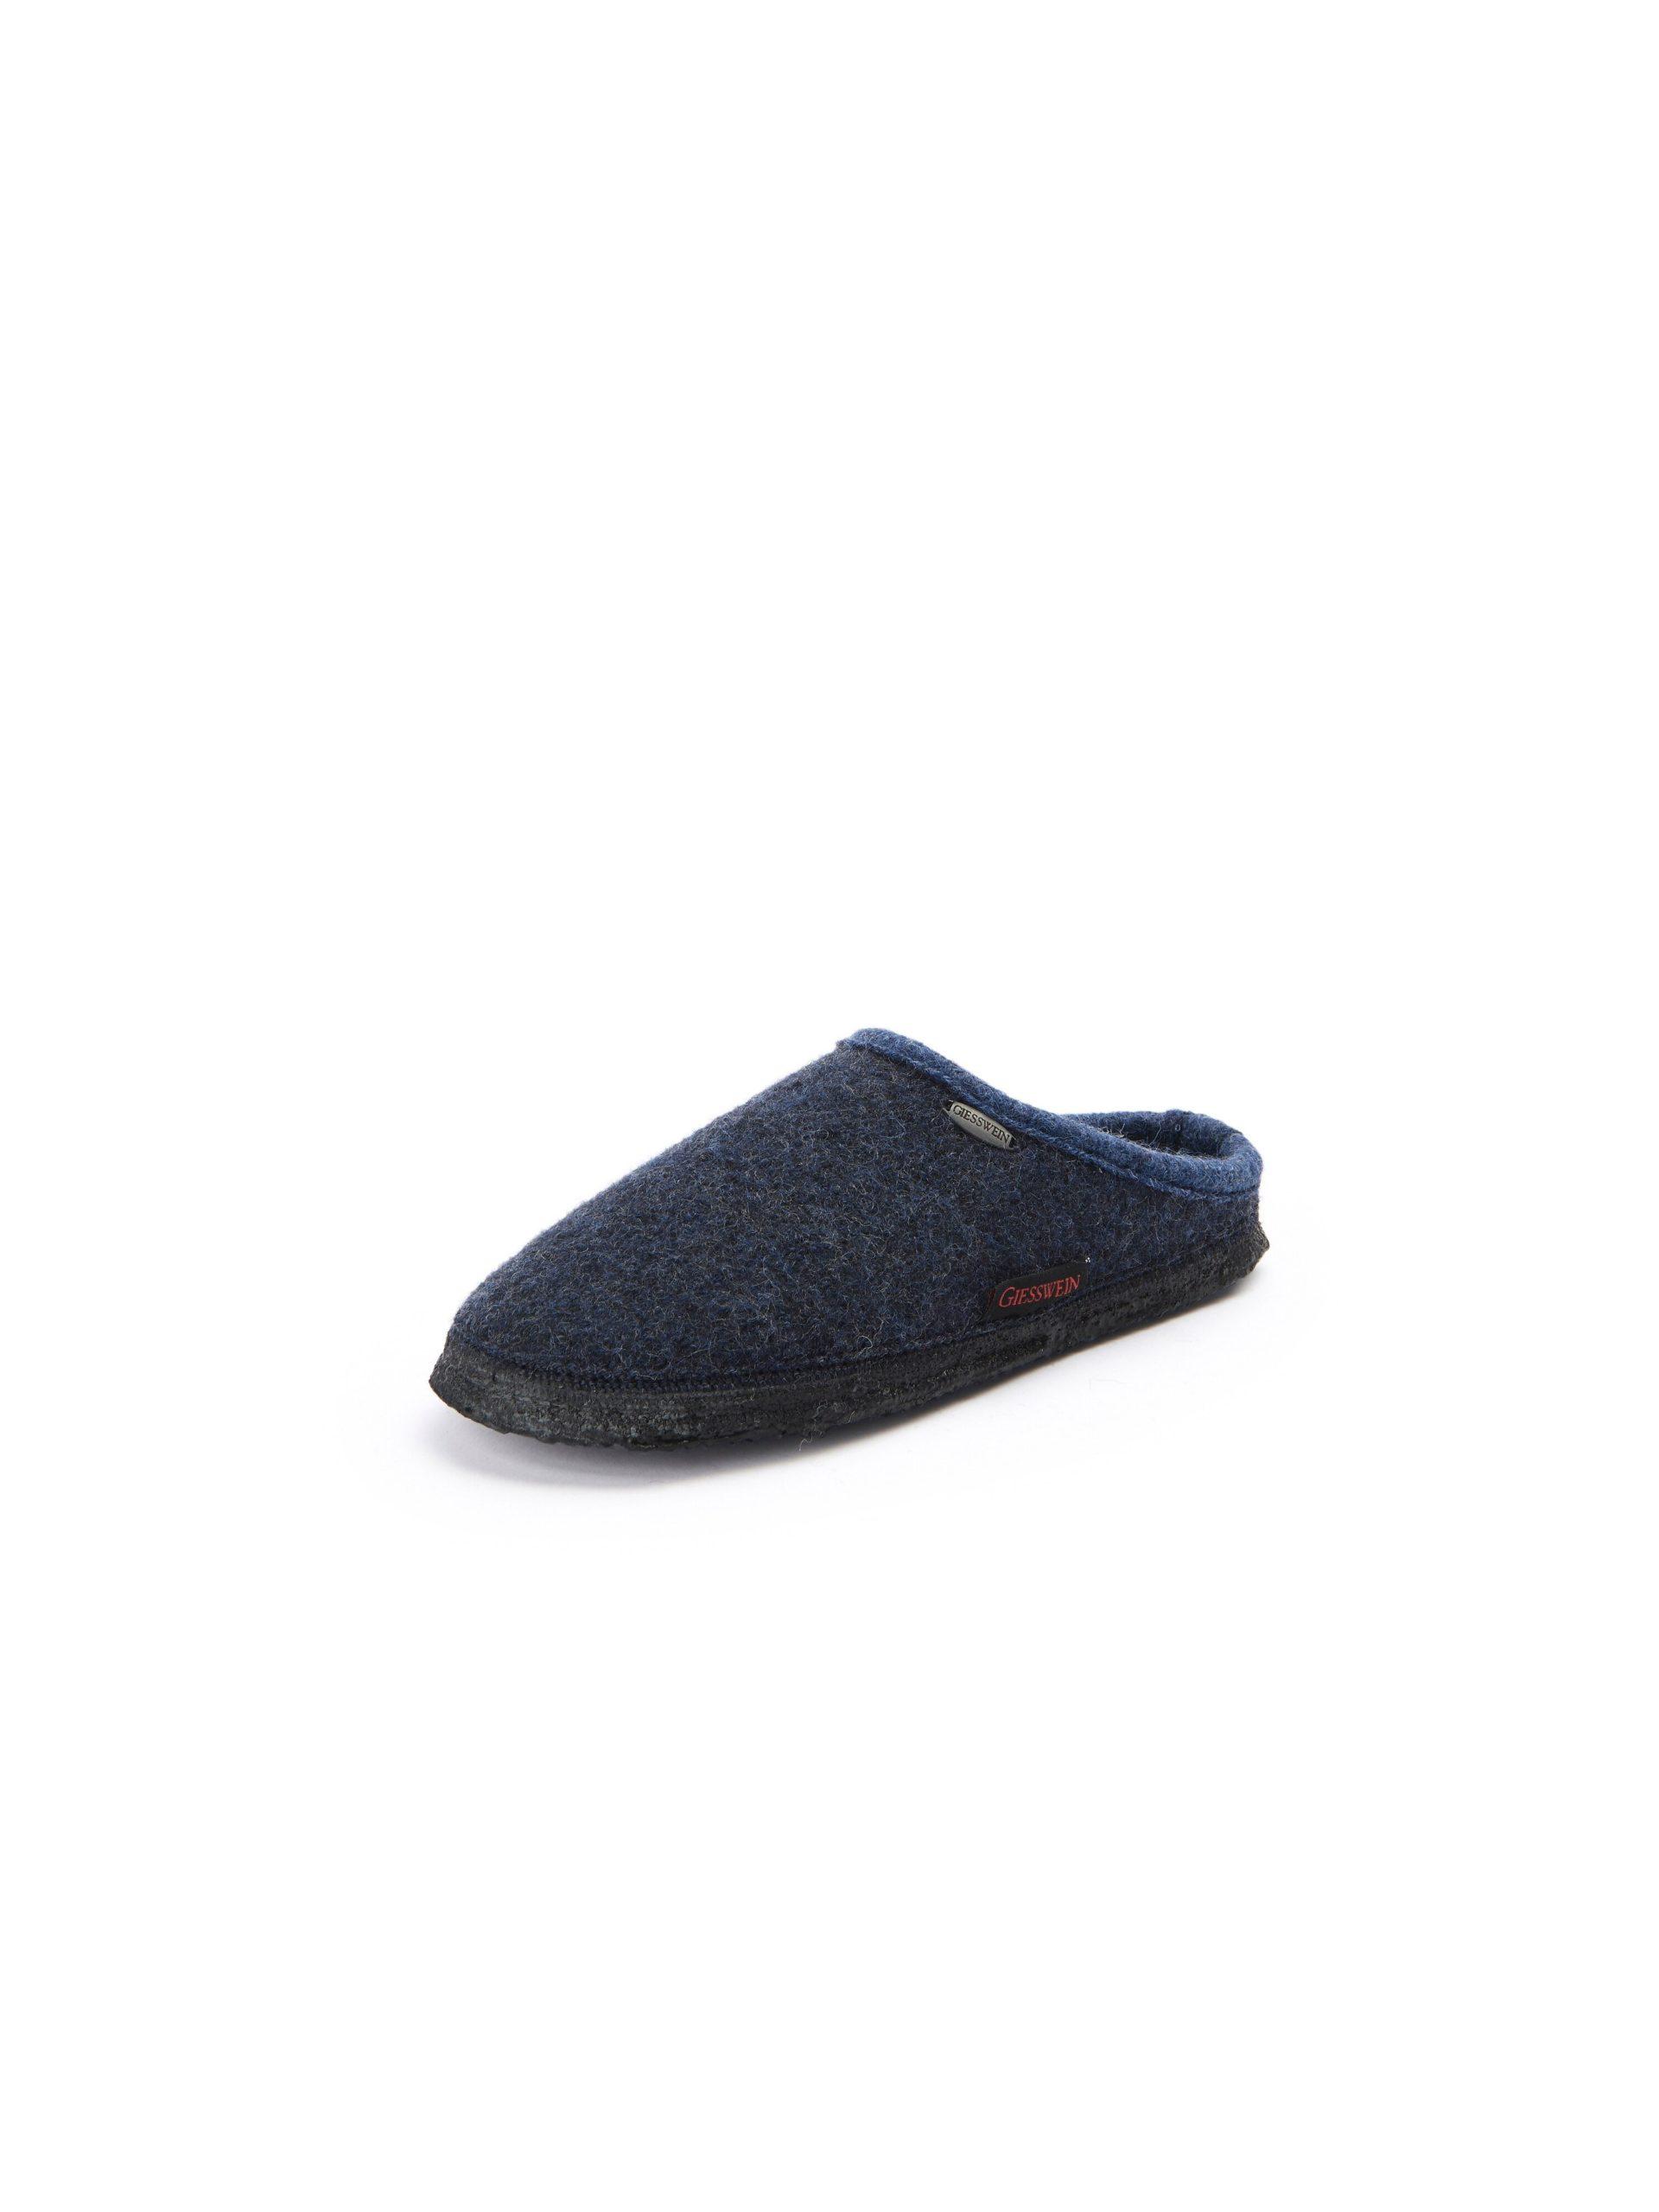 Pantoffels, model Dannheim Van Giesswein blauw Kopen